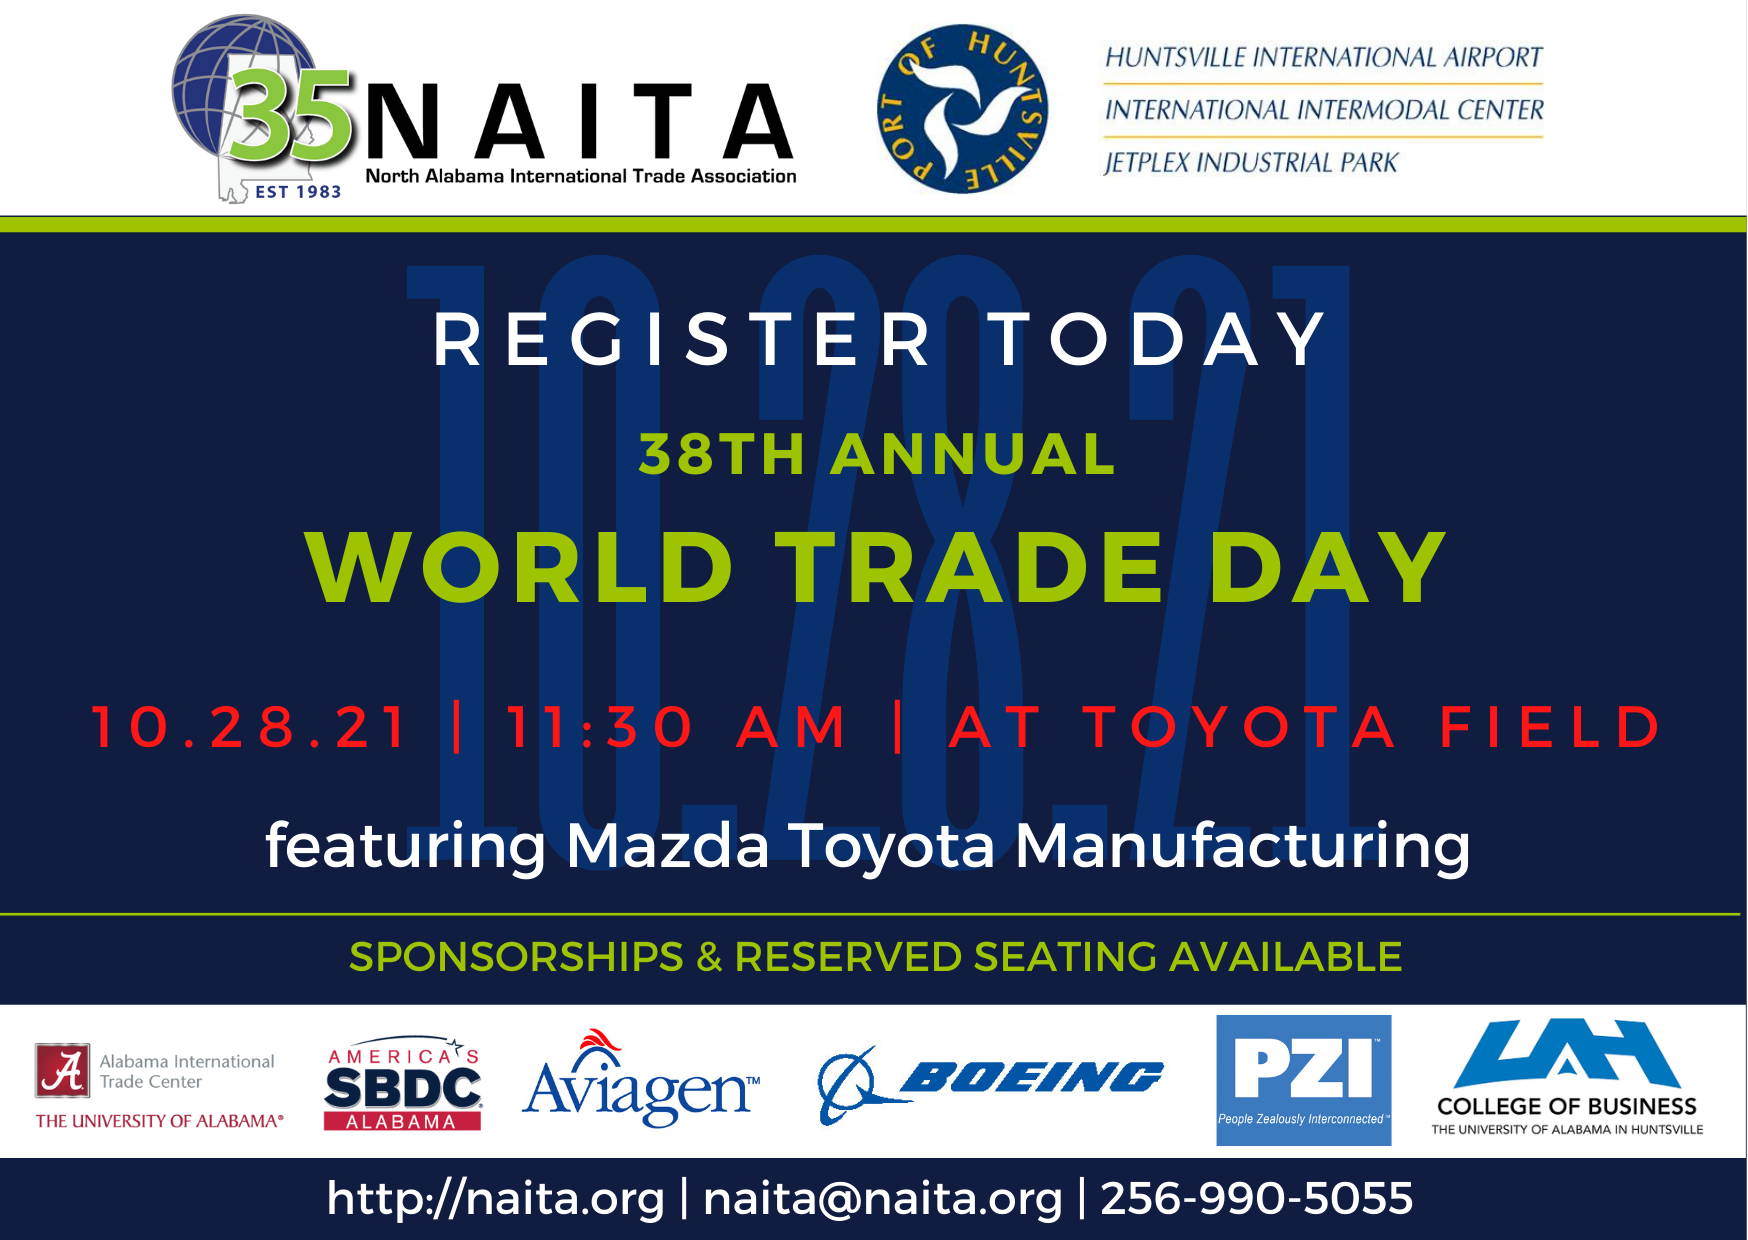 NAITA 2021 World Trade Day Celebration featuring Mazda Toyota Manufacturing @ Toyota Field